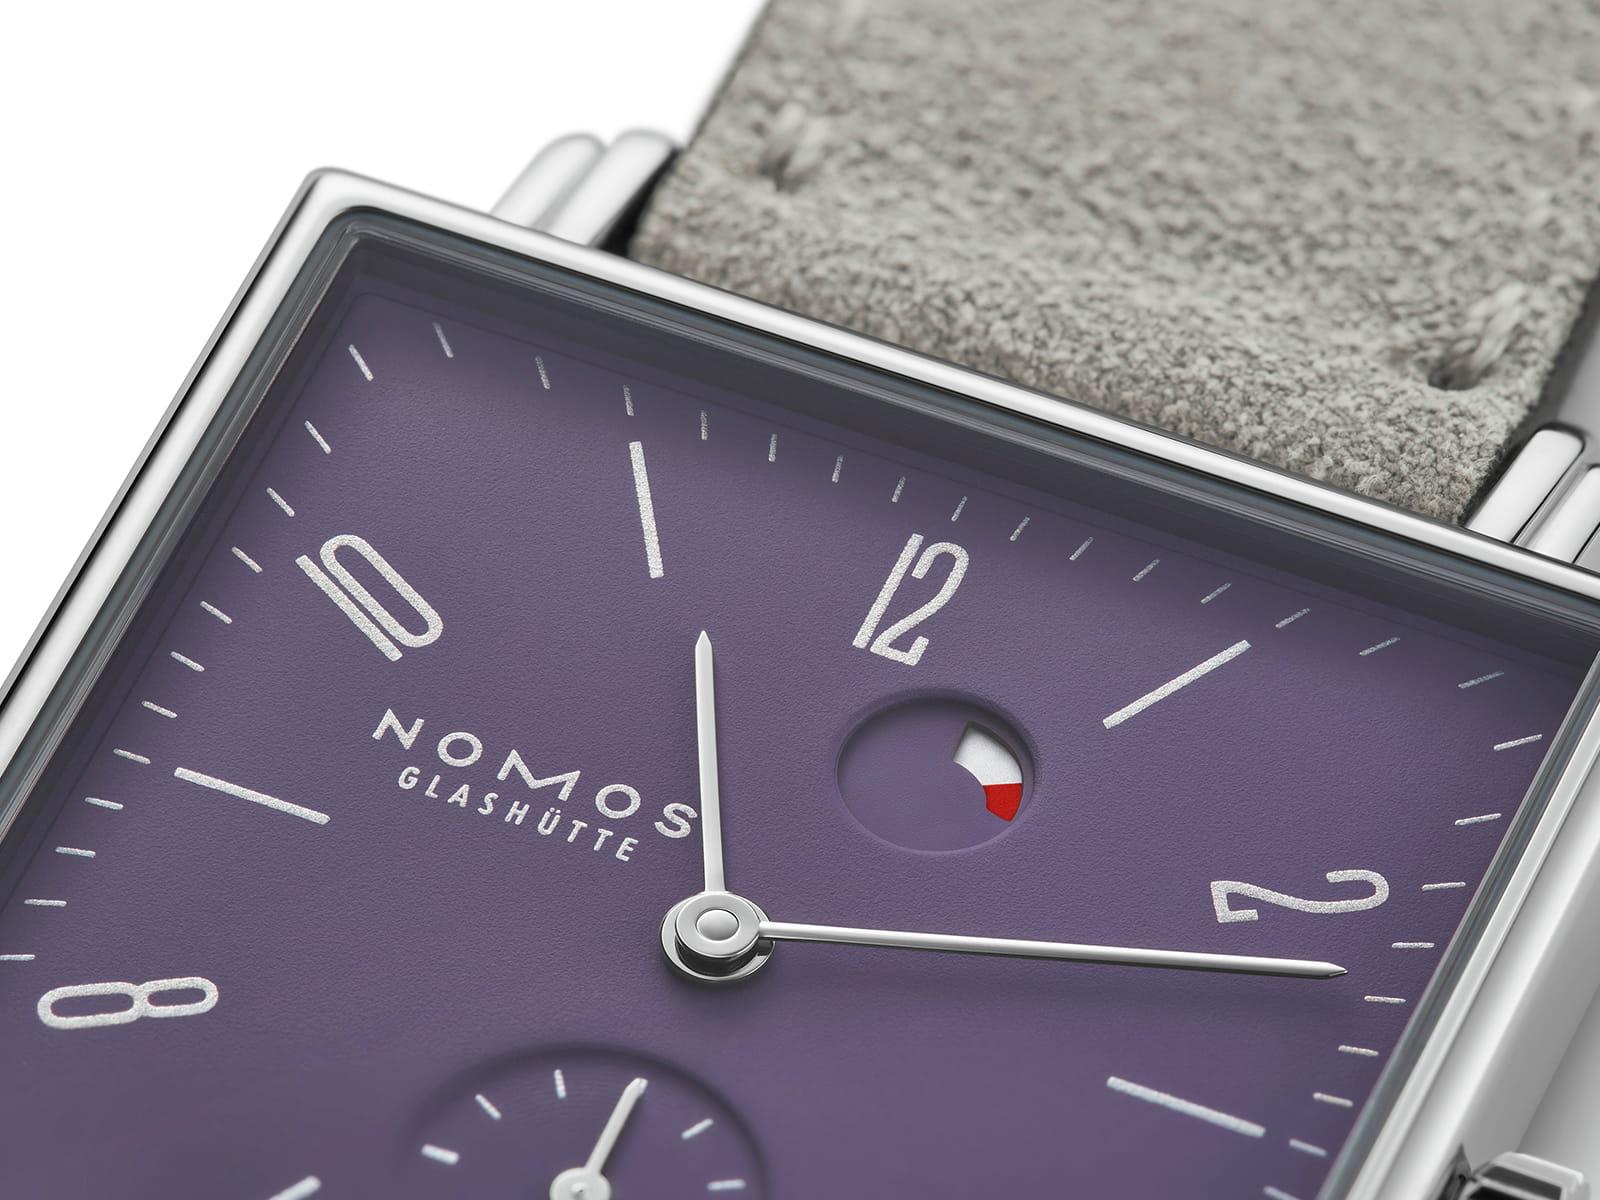 499-nomos-glashutte-tetra-plum-7.jpg